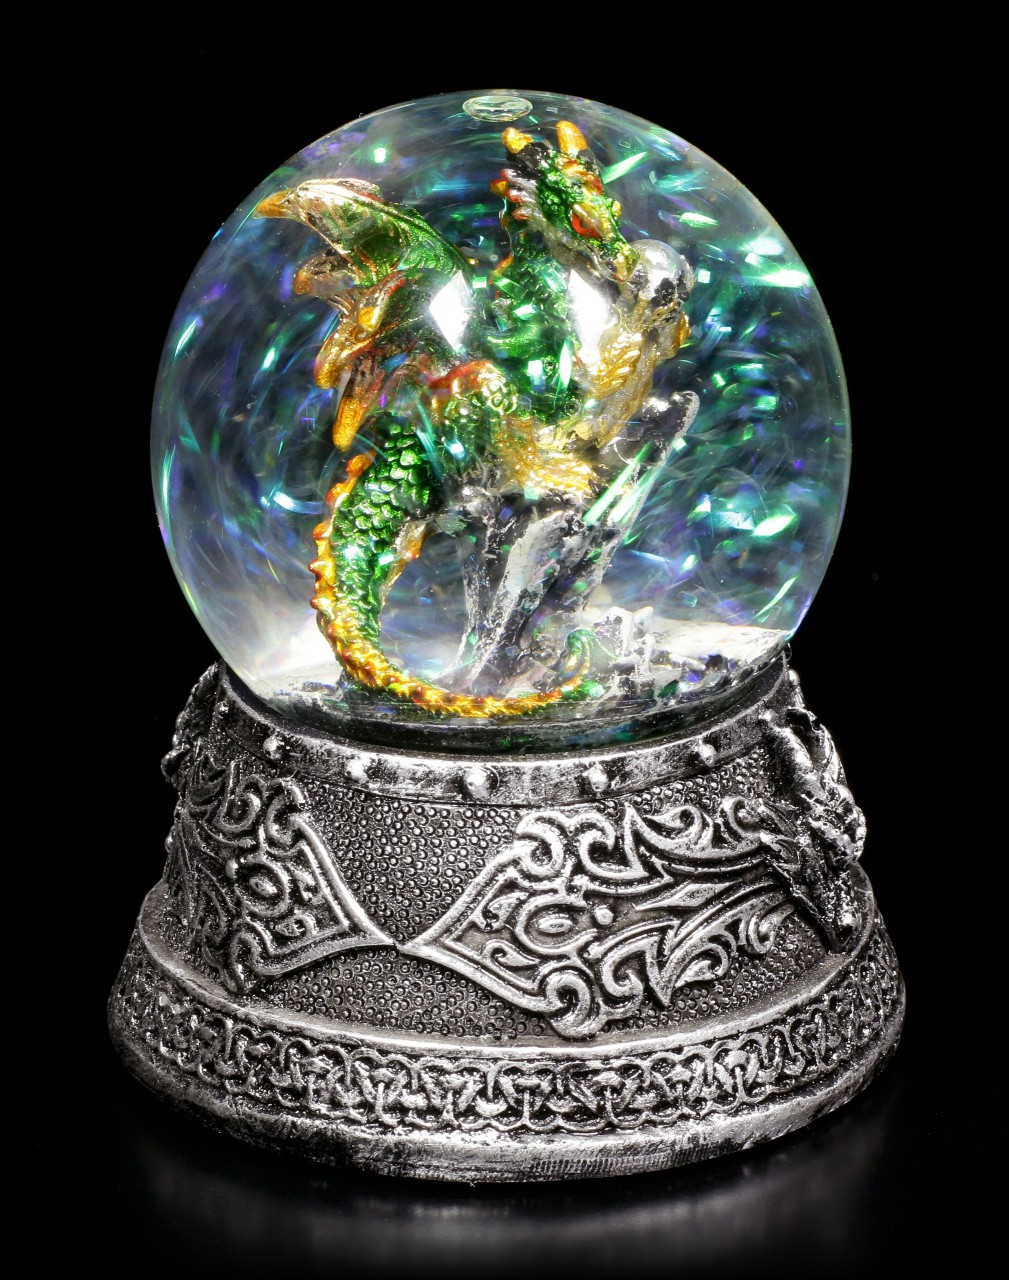 Schneekugel mit Drache - Enchanted Emerald